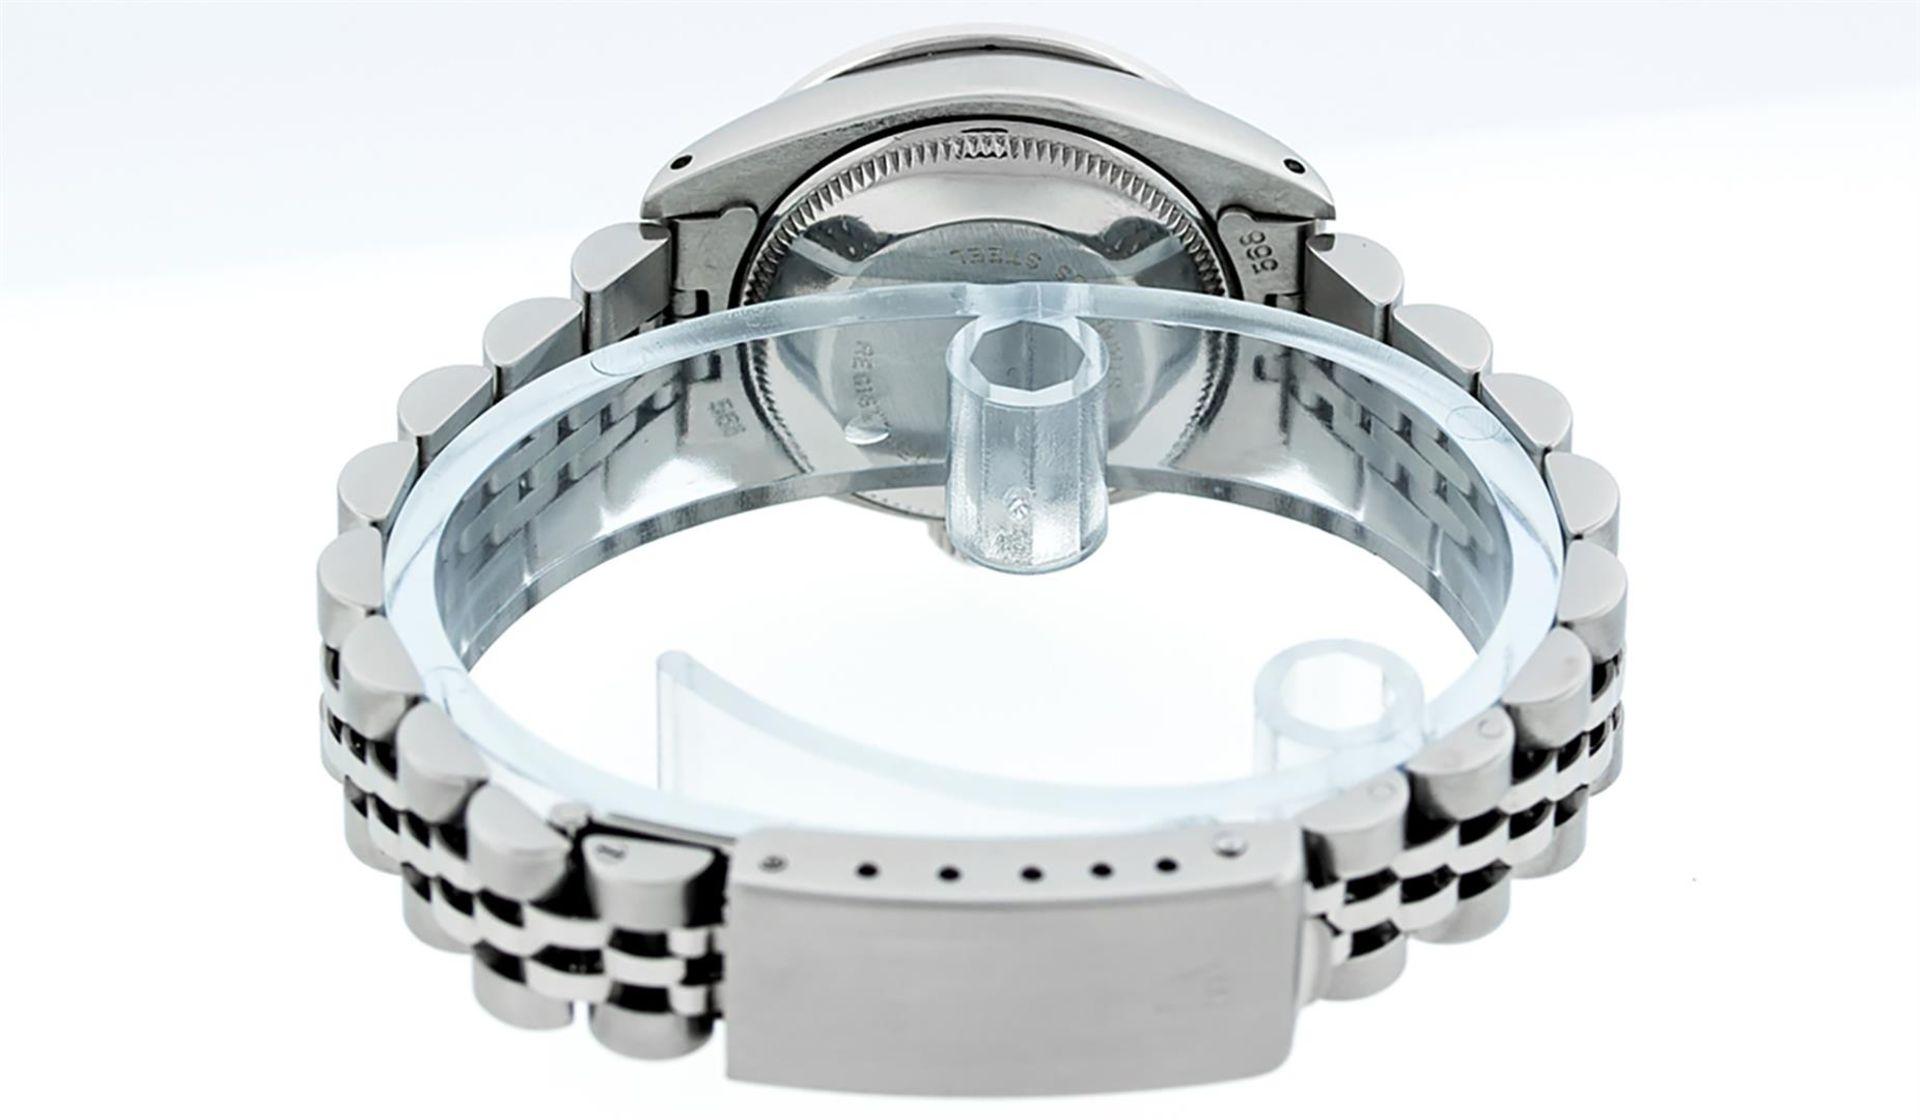 Rolex Ladies Stainless Steel Yellow MOP Emerald & Diamond Datejust Wristwatch - Image 5 of 7